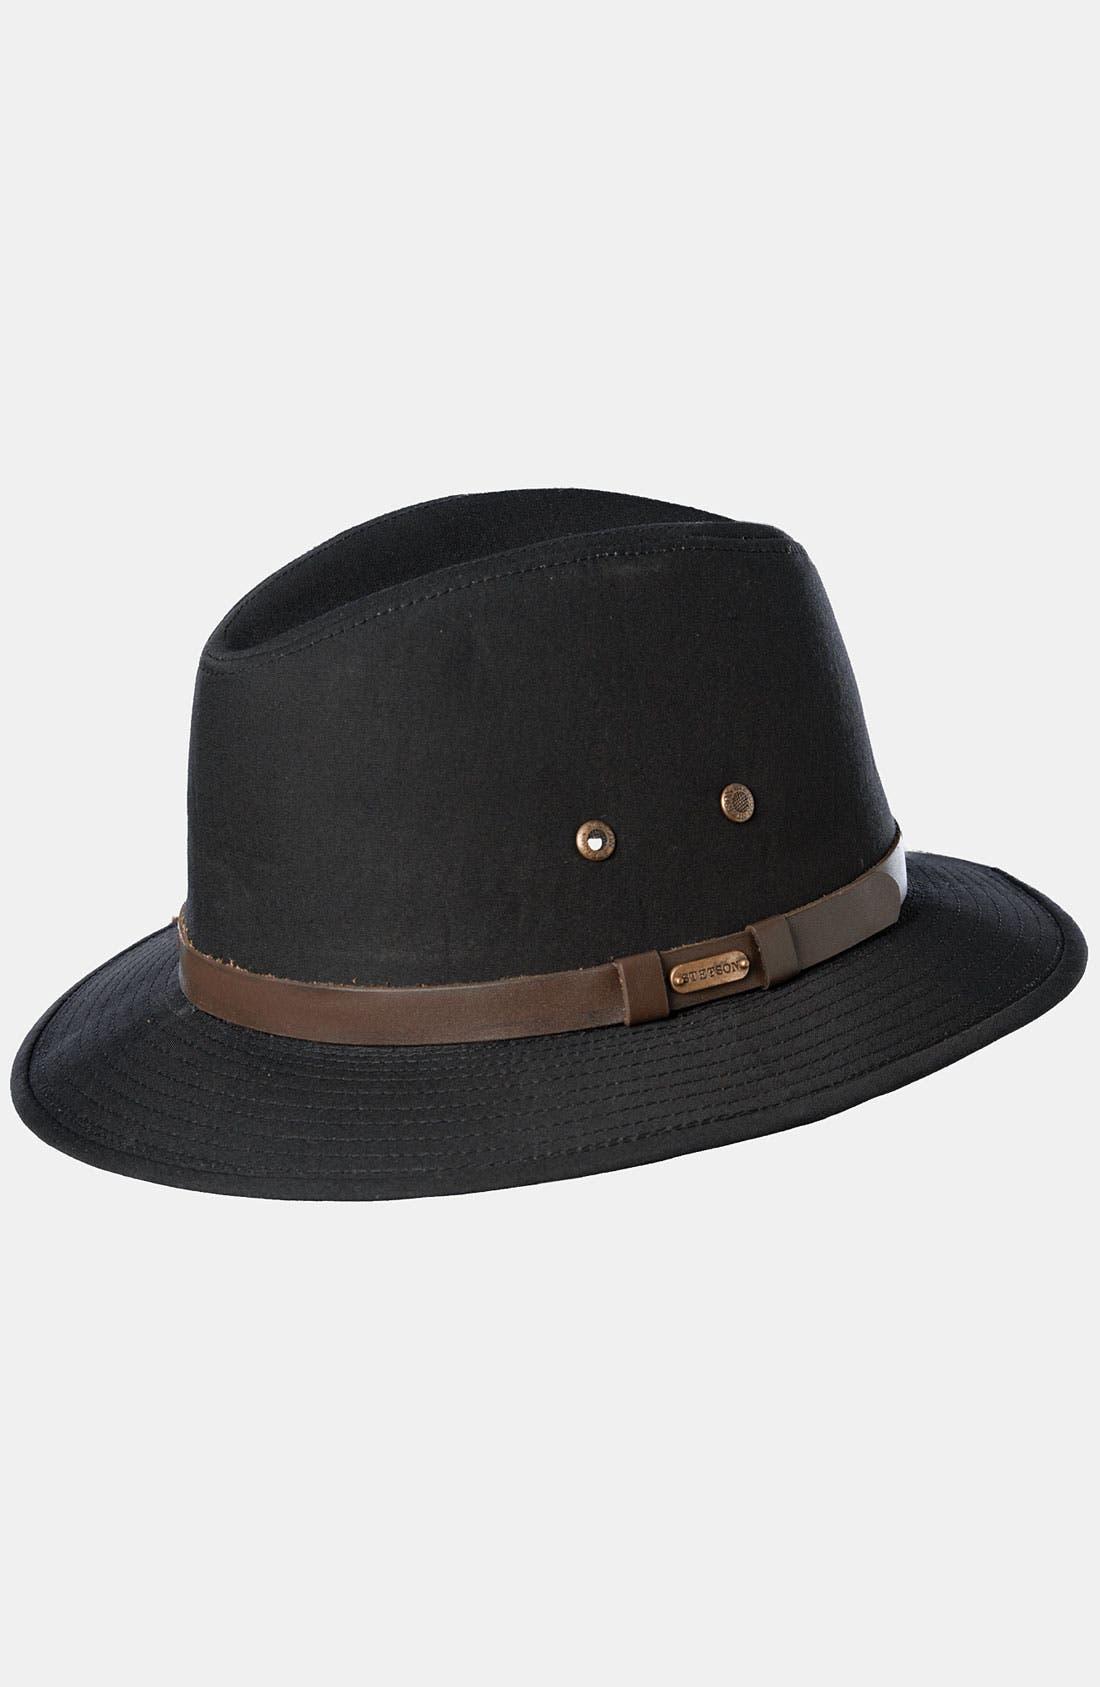 Main Image - Stetson Water Repellent Safari Hat